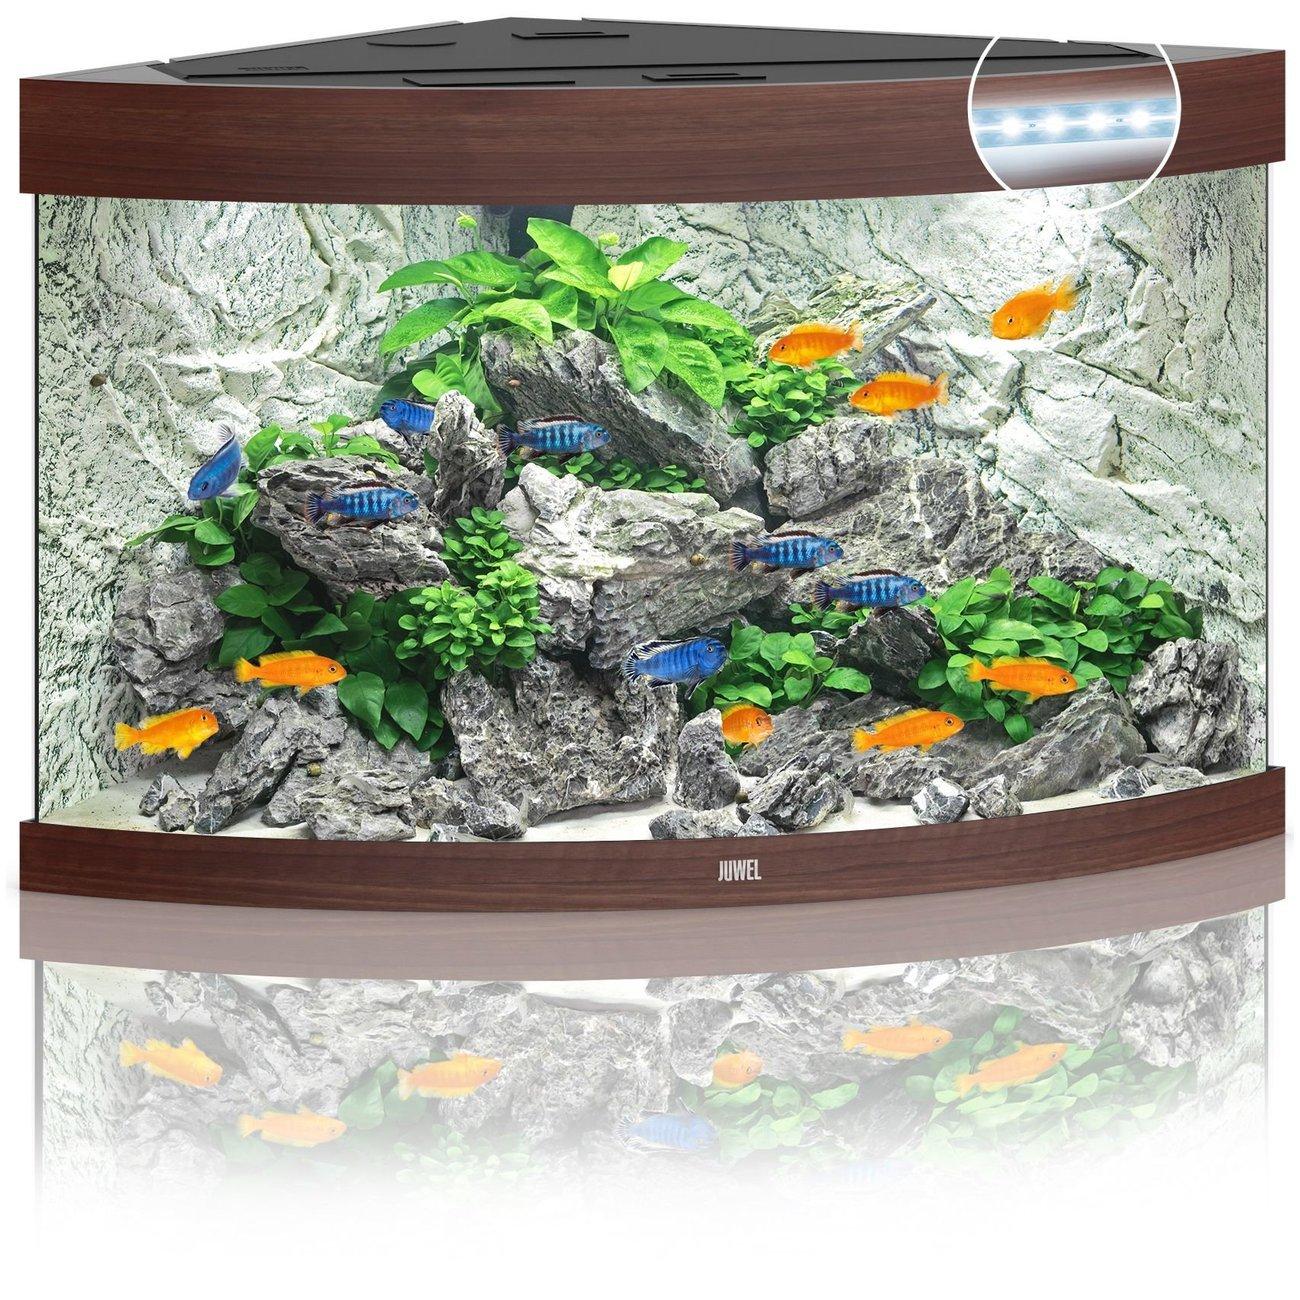 Juwel Trigon 190 LED Aquarium, Bild 2